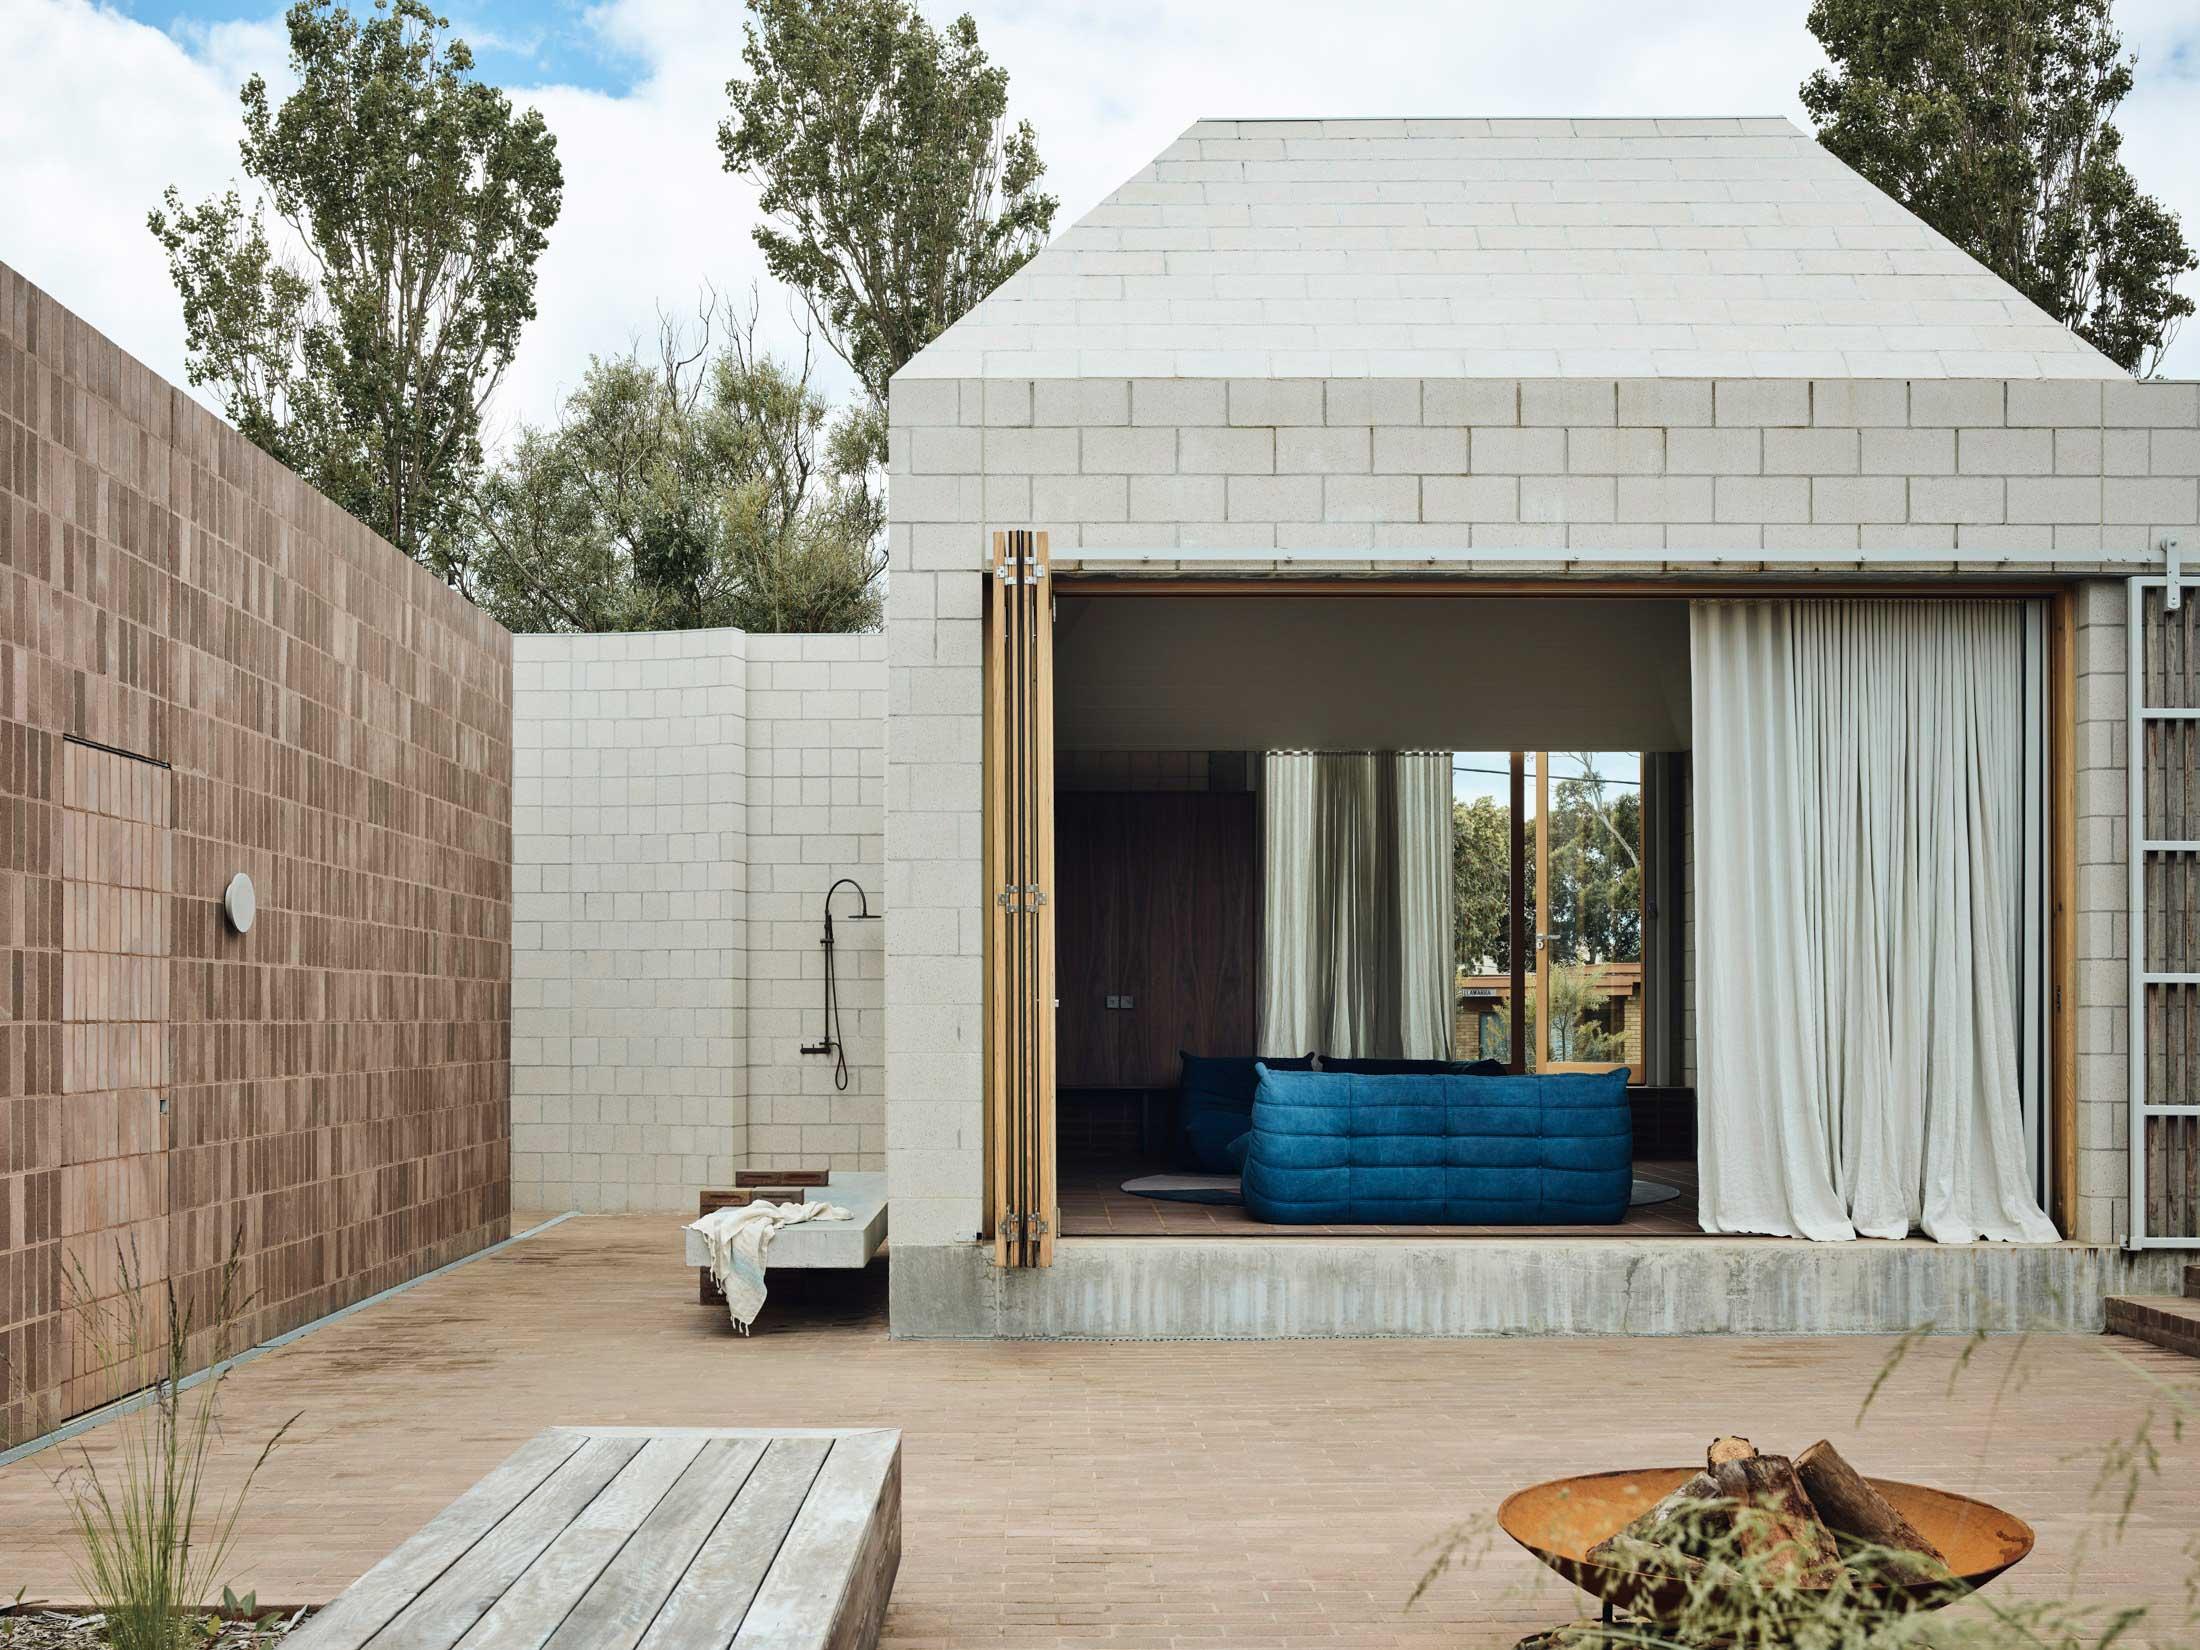 Architects Eat Bellows Beach House Flinders Masonry Architecture Photo Derek Swalwell Yellowtrace 12